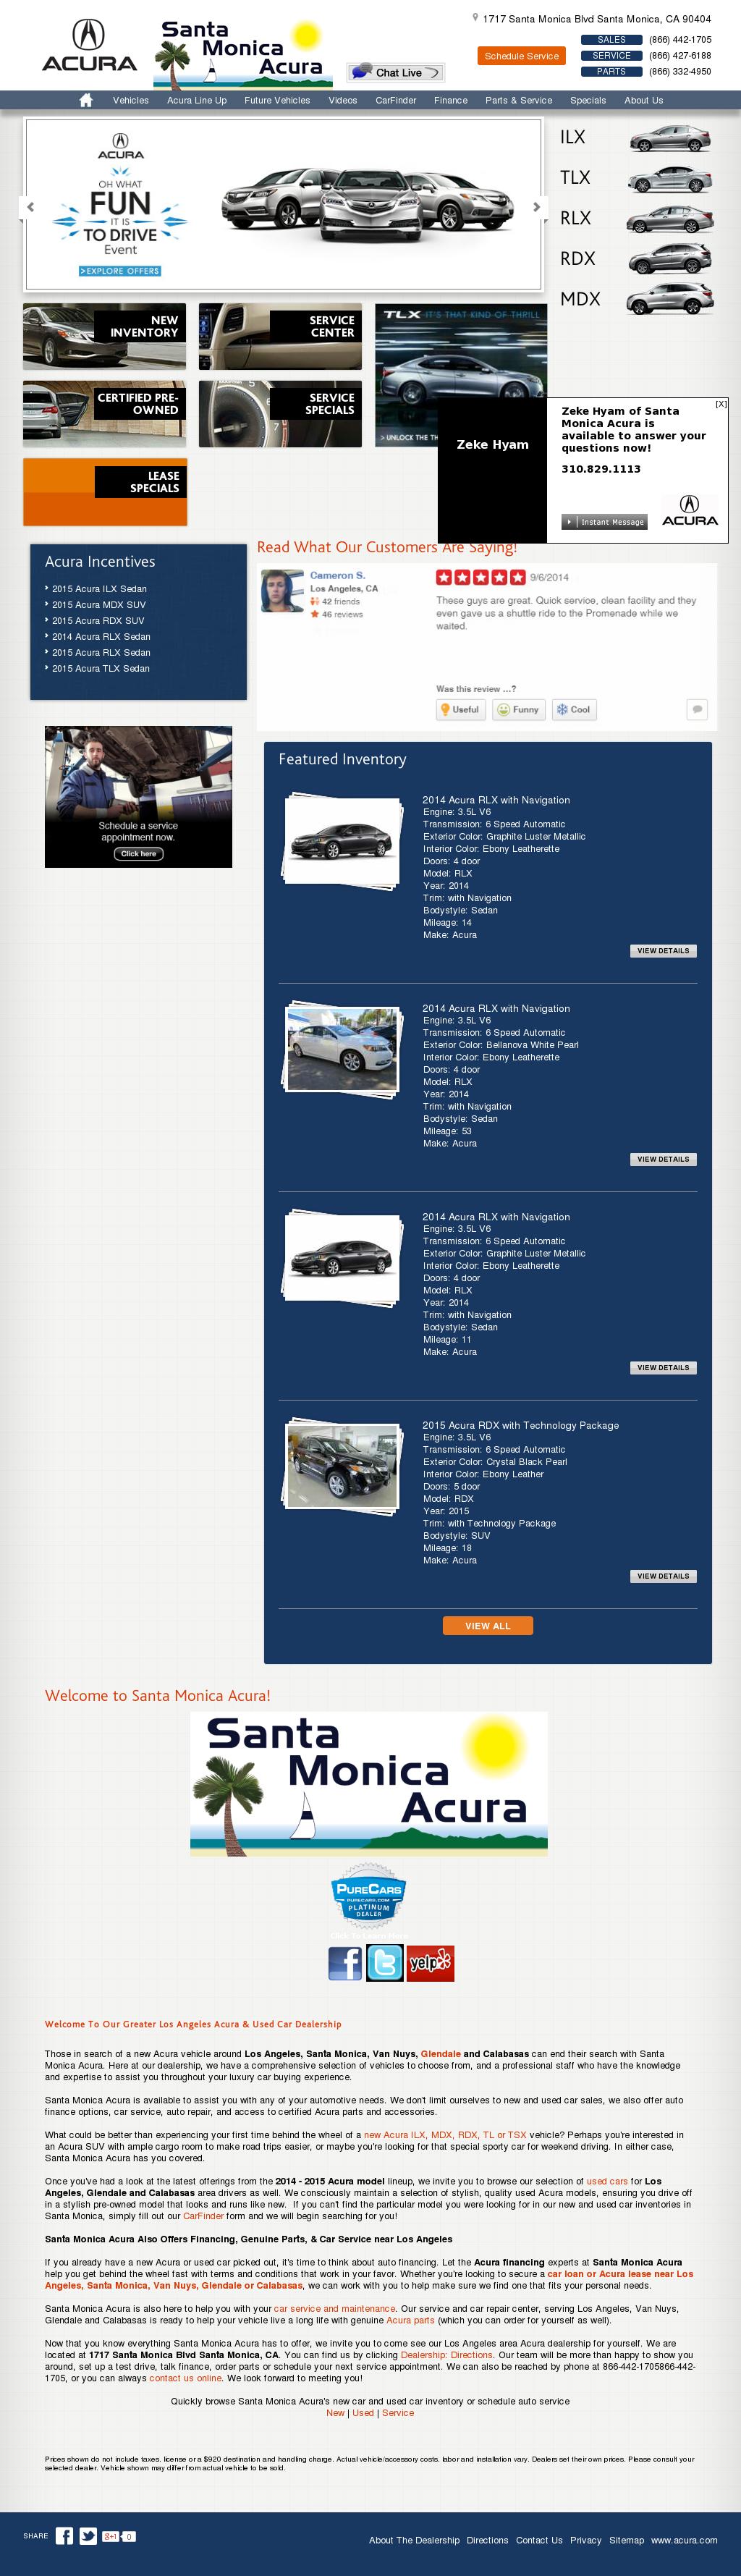 Acura Santa Monica >> Santa Monica Acura Competitors Revenue And Employees Owler